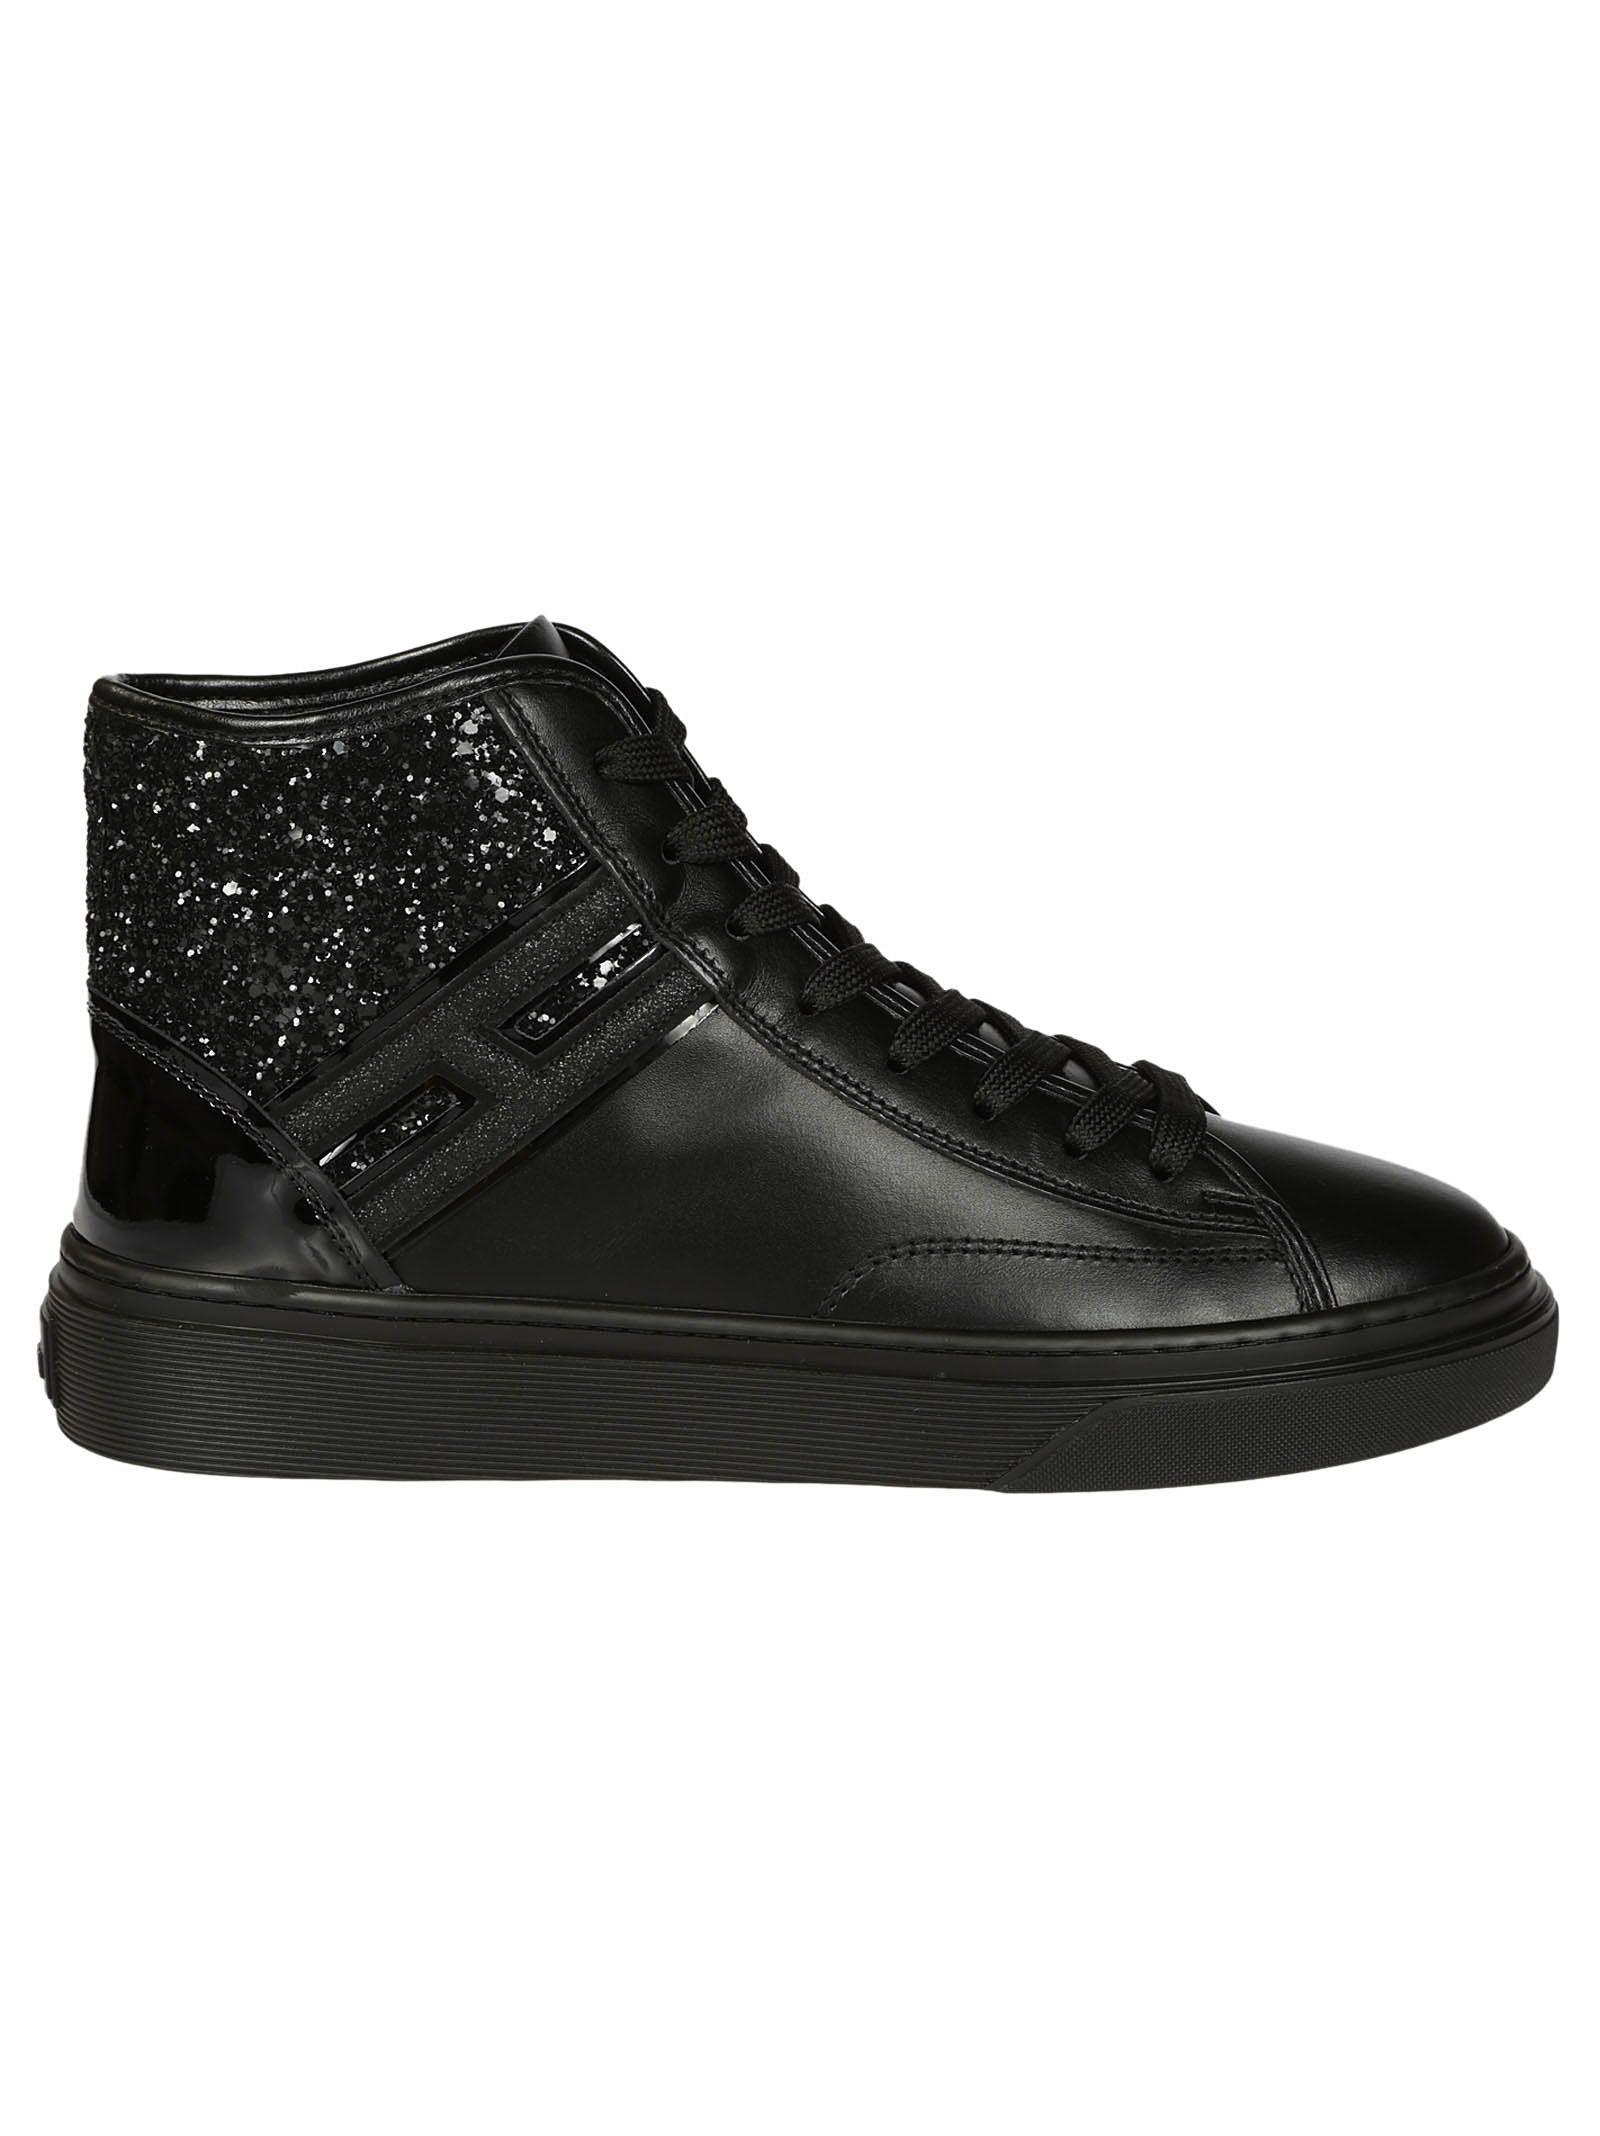 Hogan H342 Glitter Hi-top Sneakers